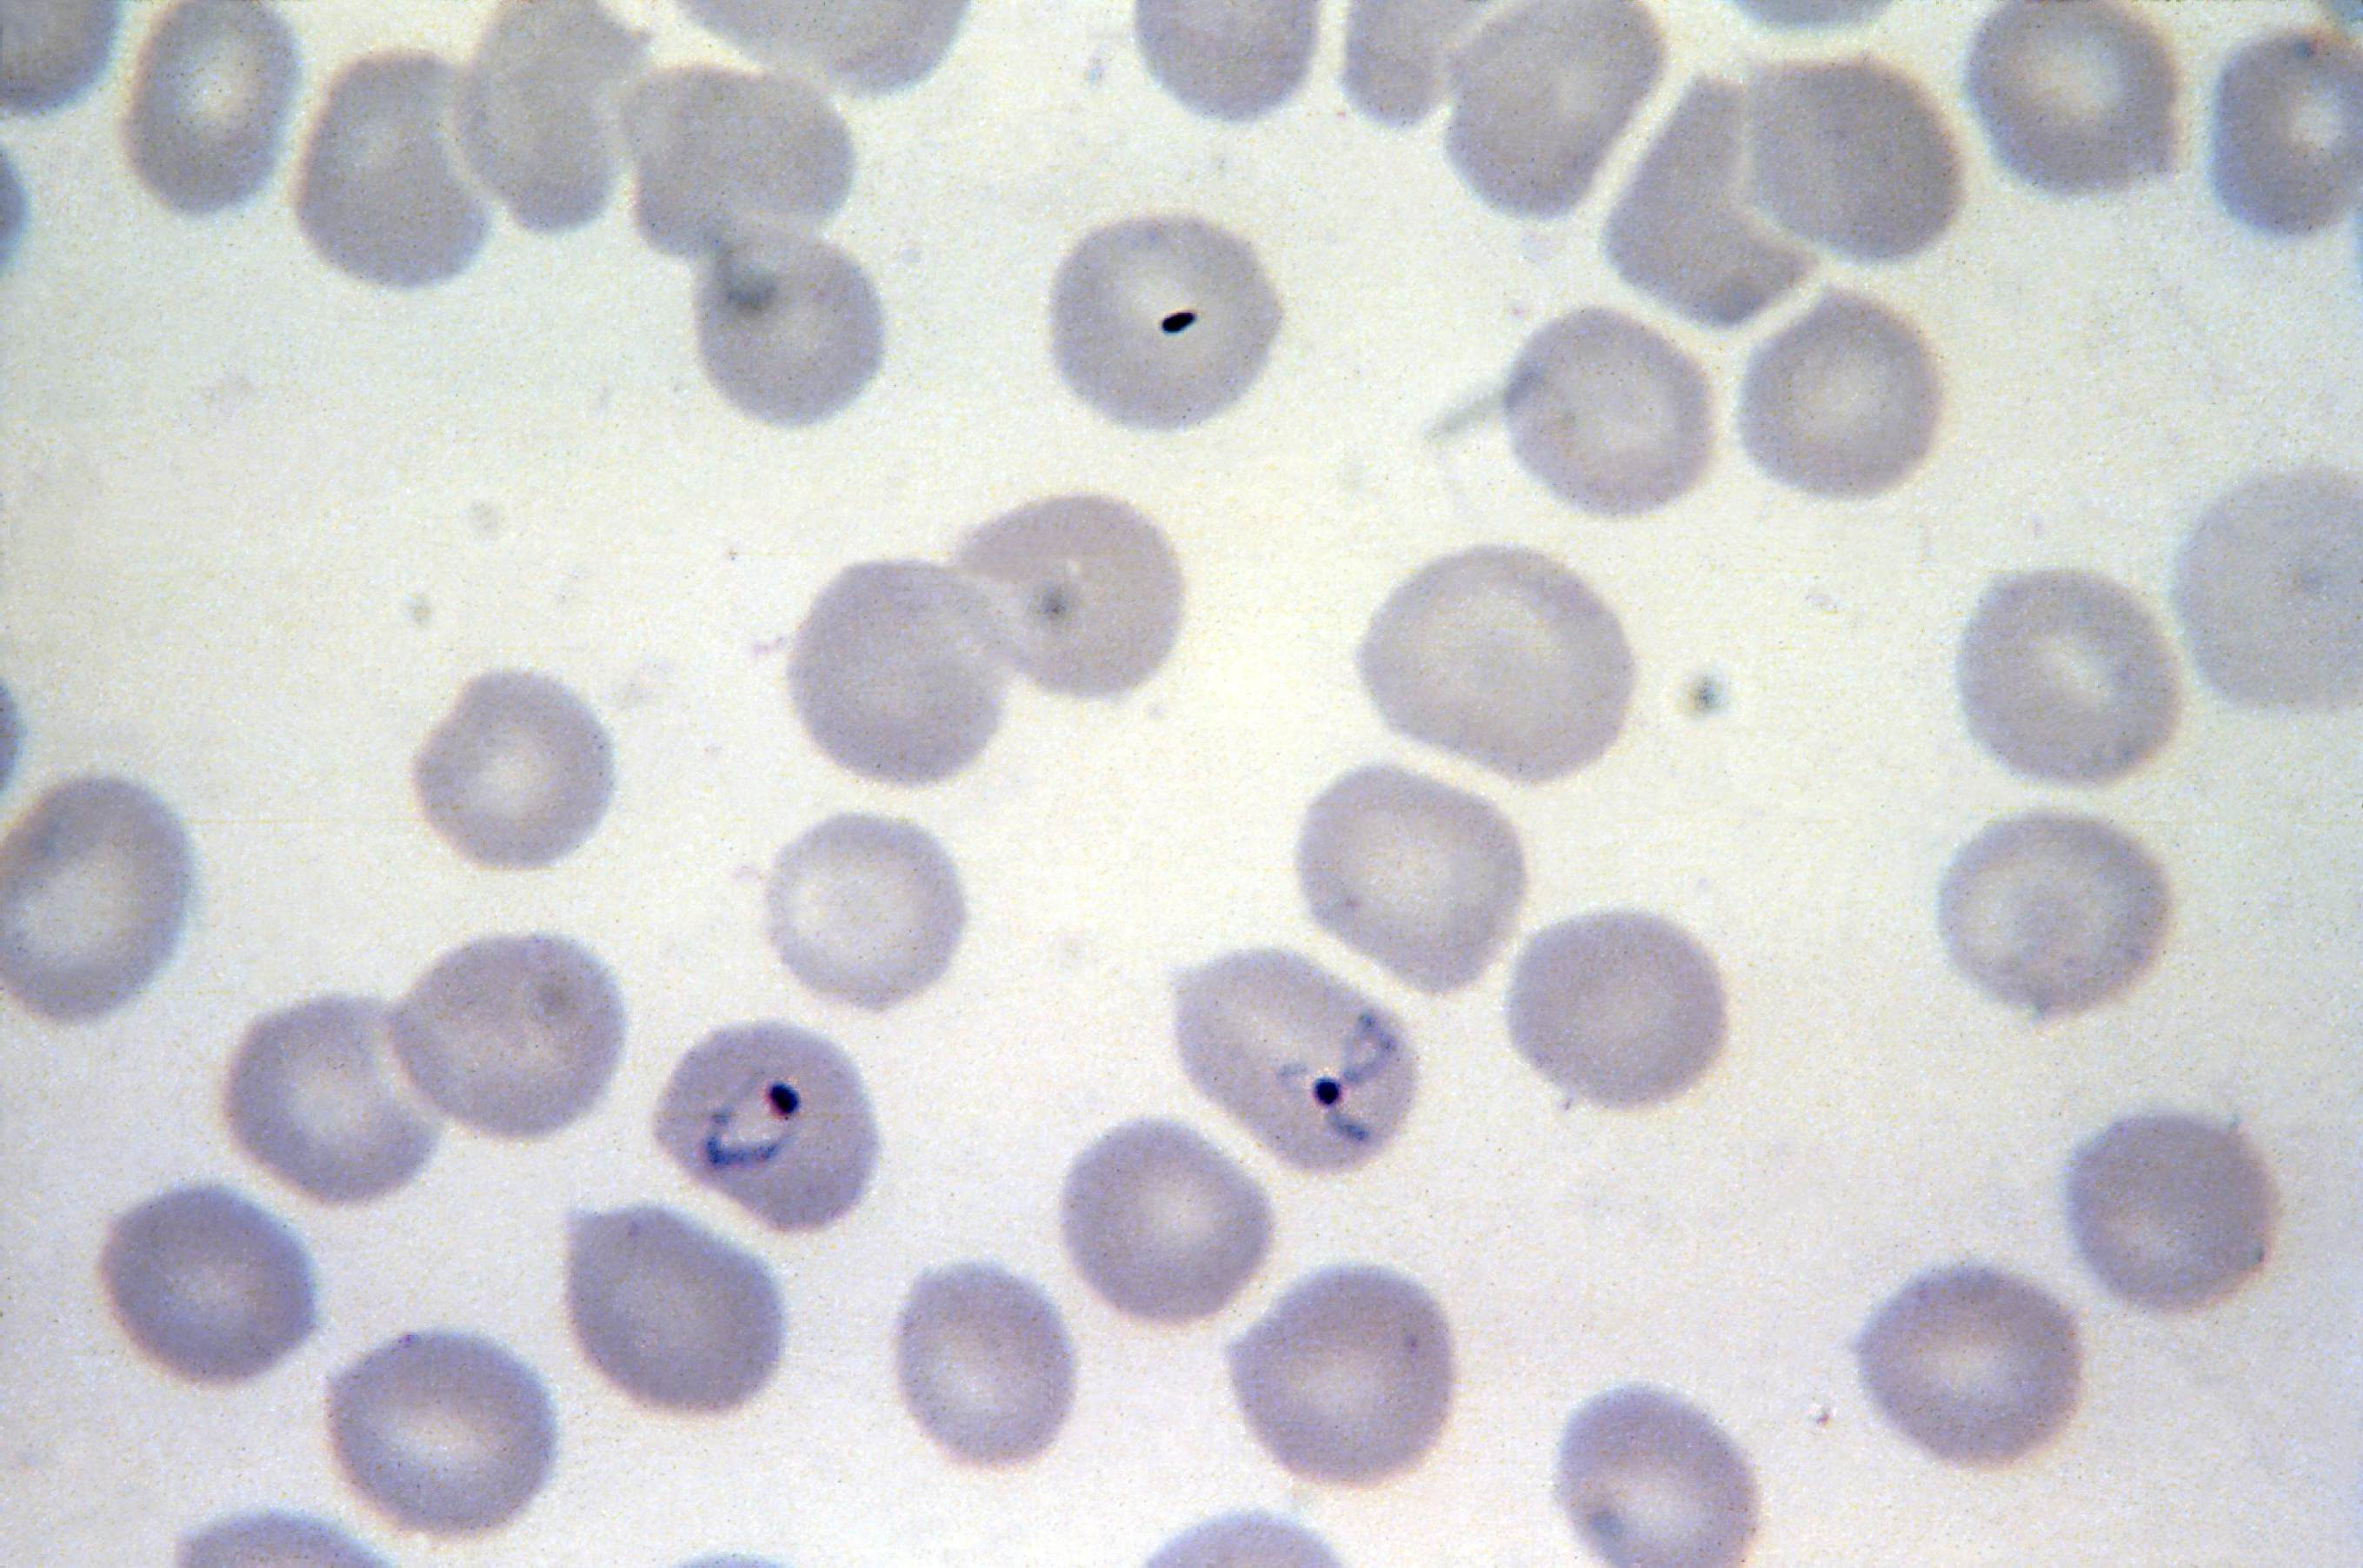 Free picture micrograph plasmodium vivax ring form